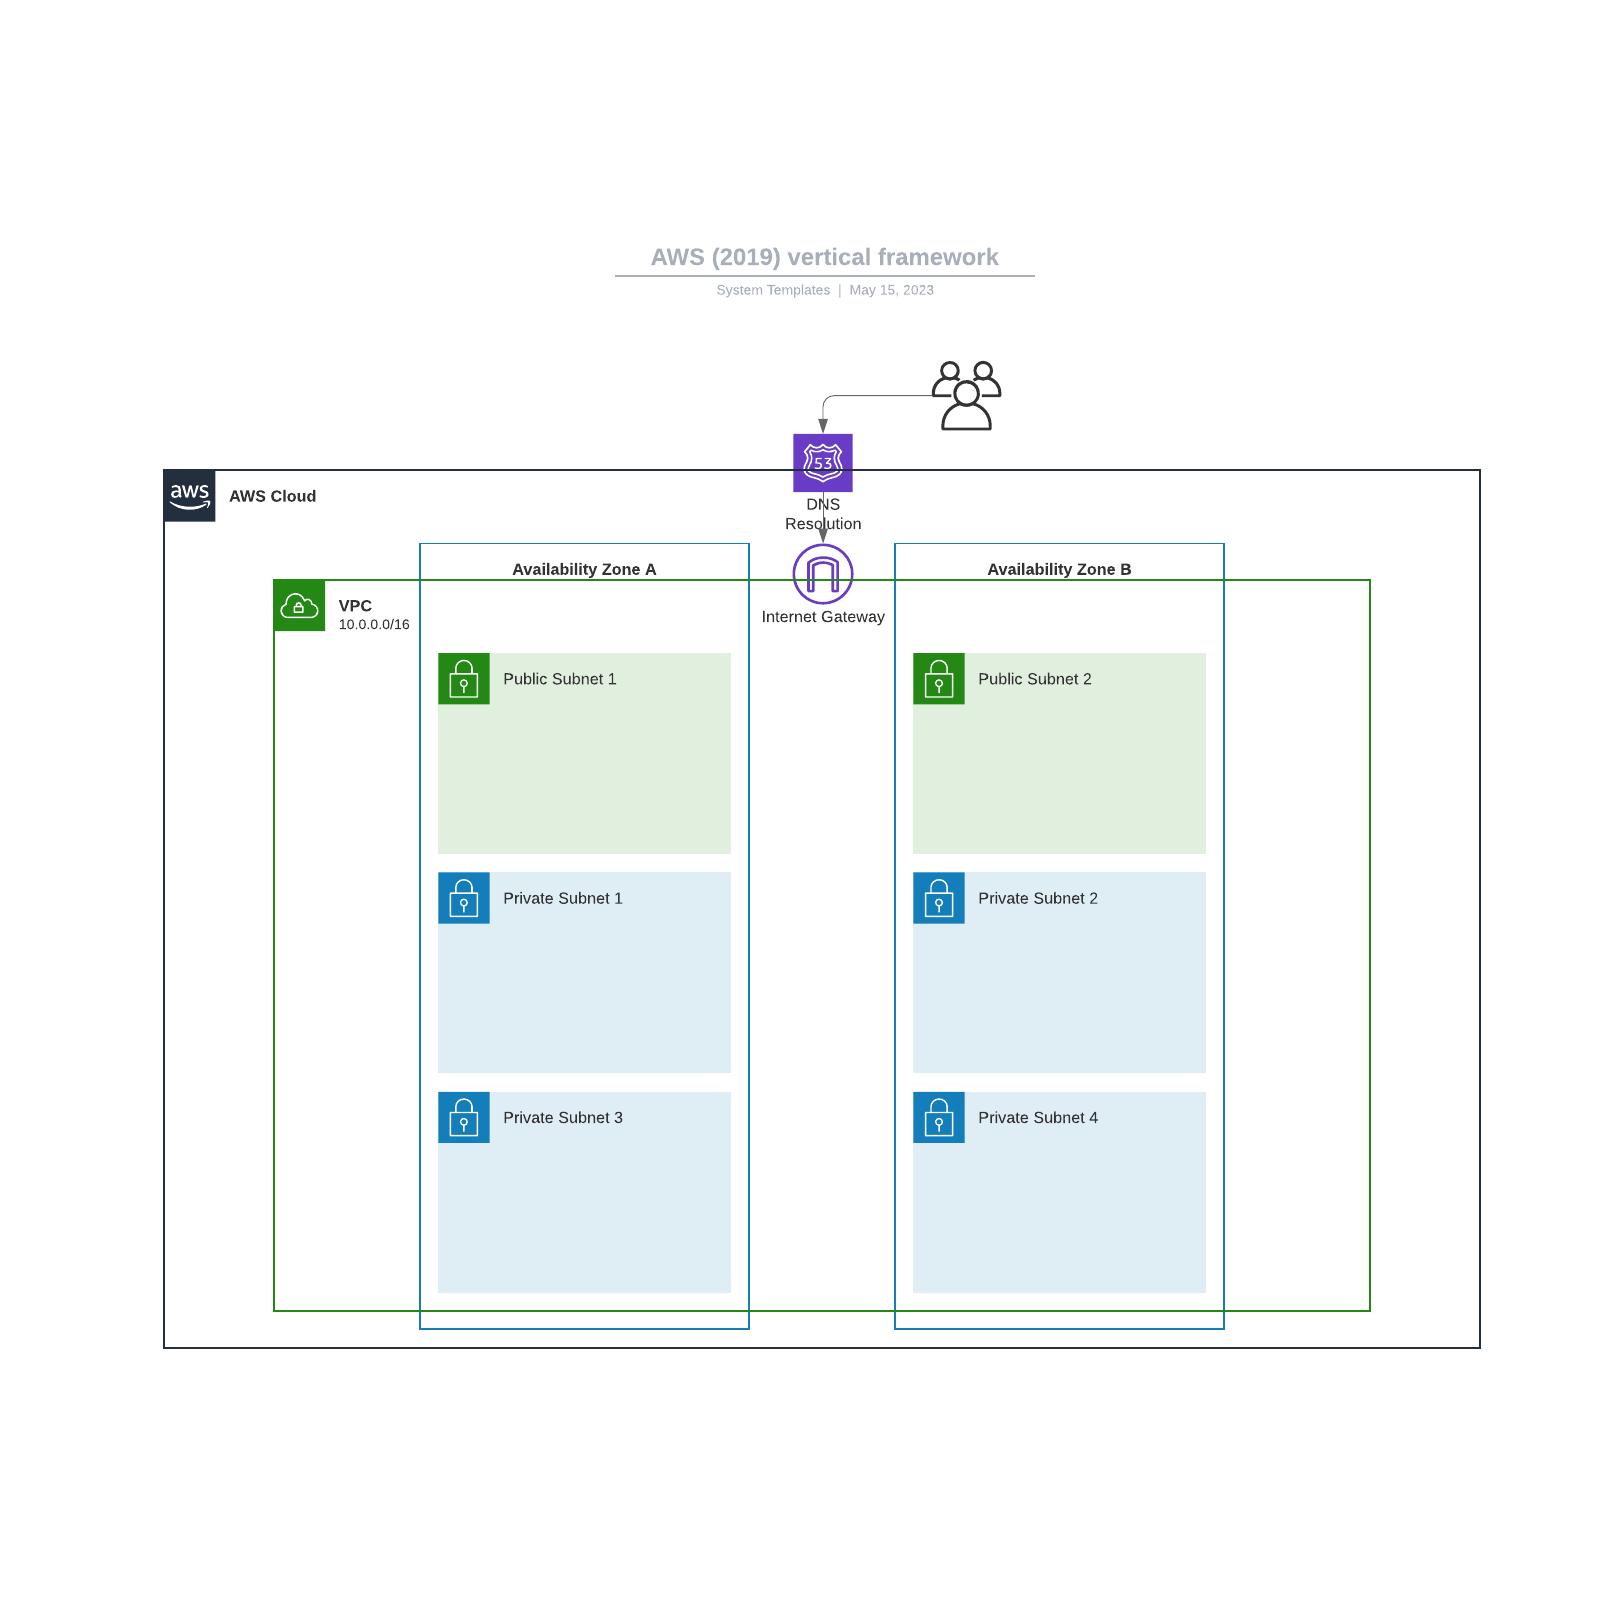 AWS (2019) vertical framework